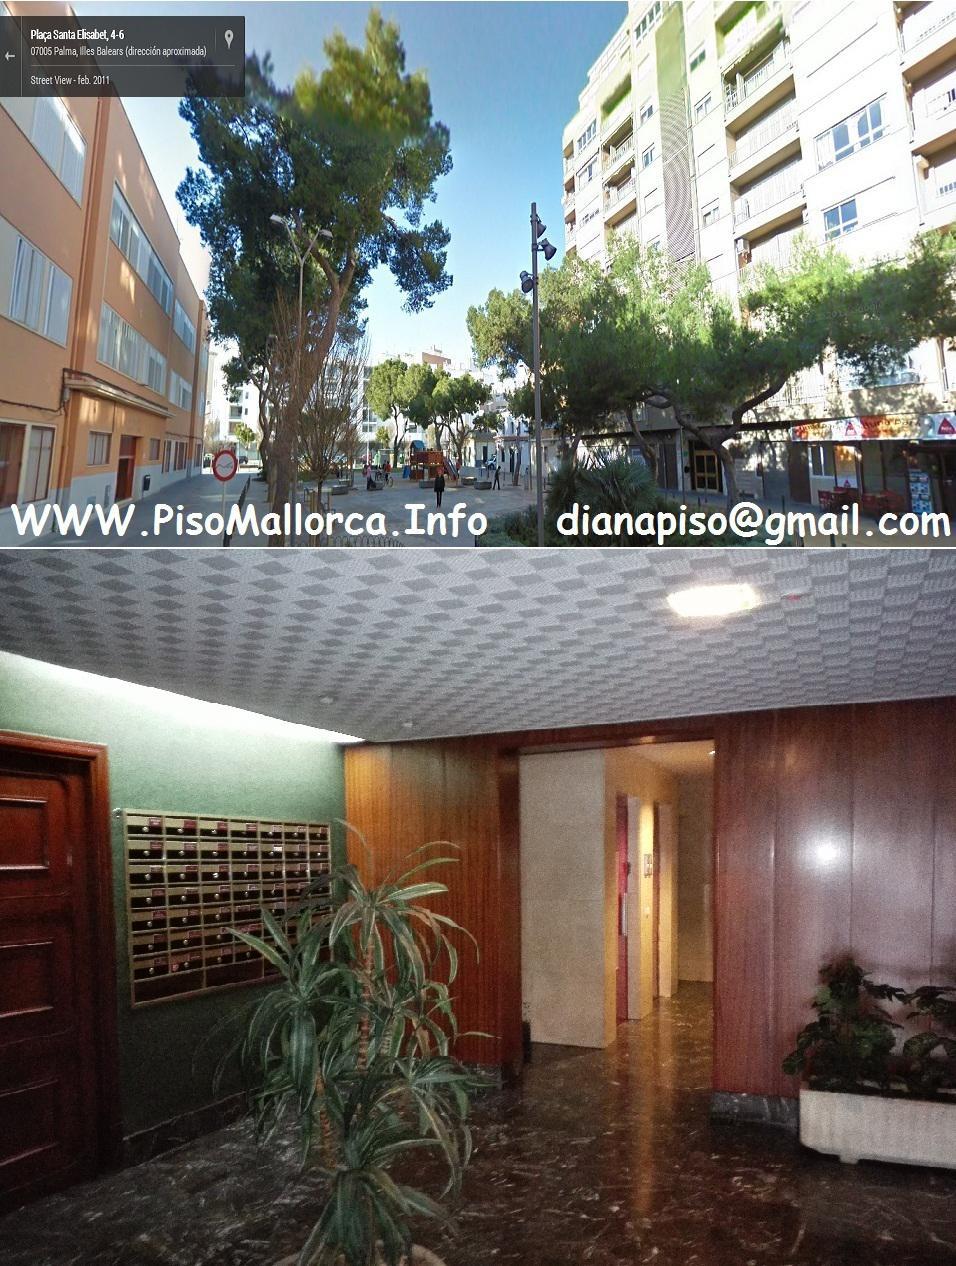 plazaentrada-ConvertImage